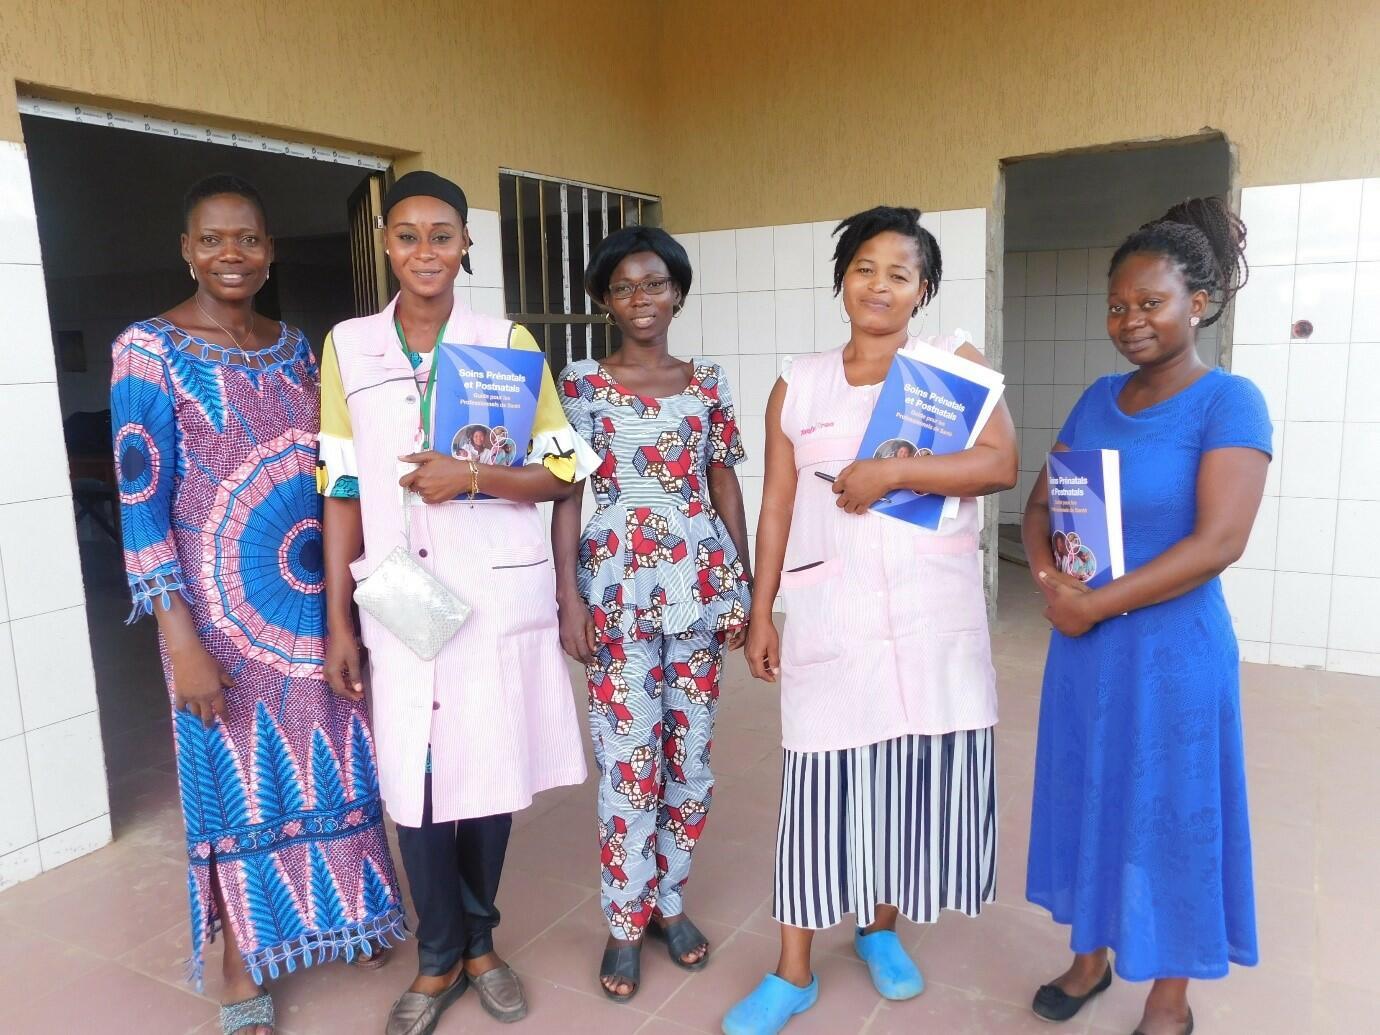 The QI team at Atakpame Regional Hospital